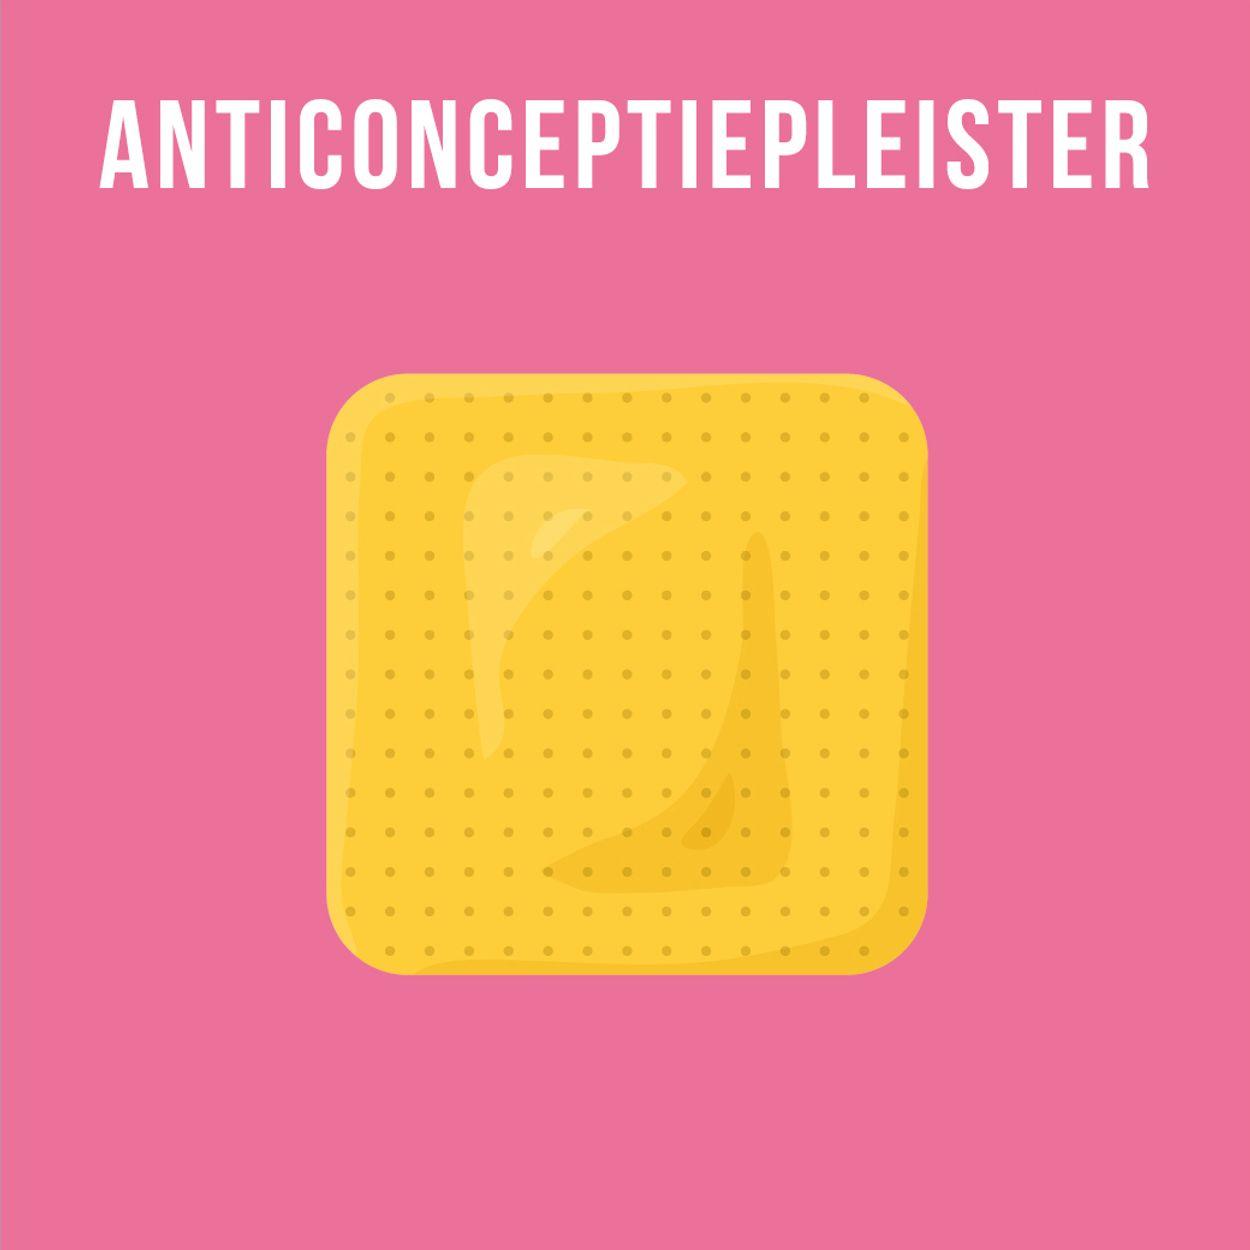 Anticonceptiepleister